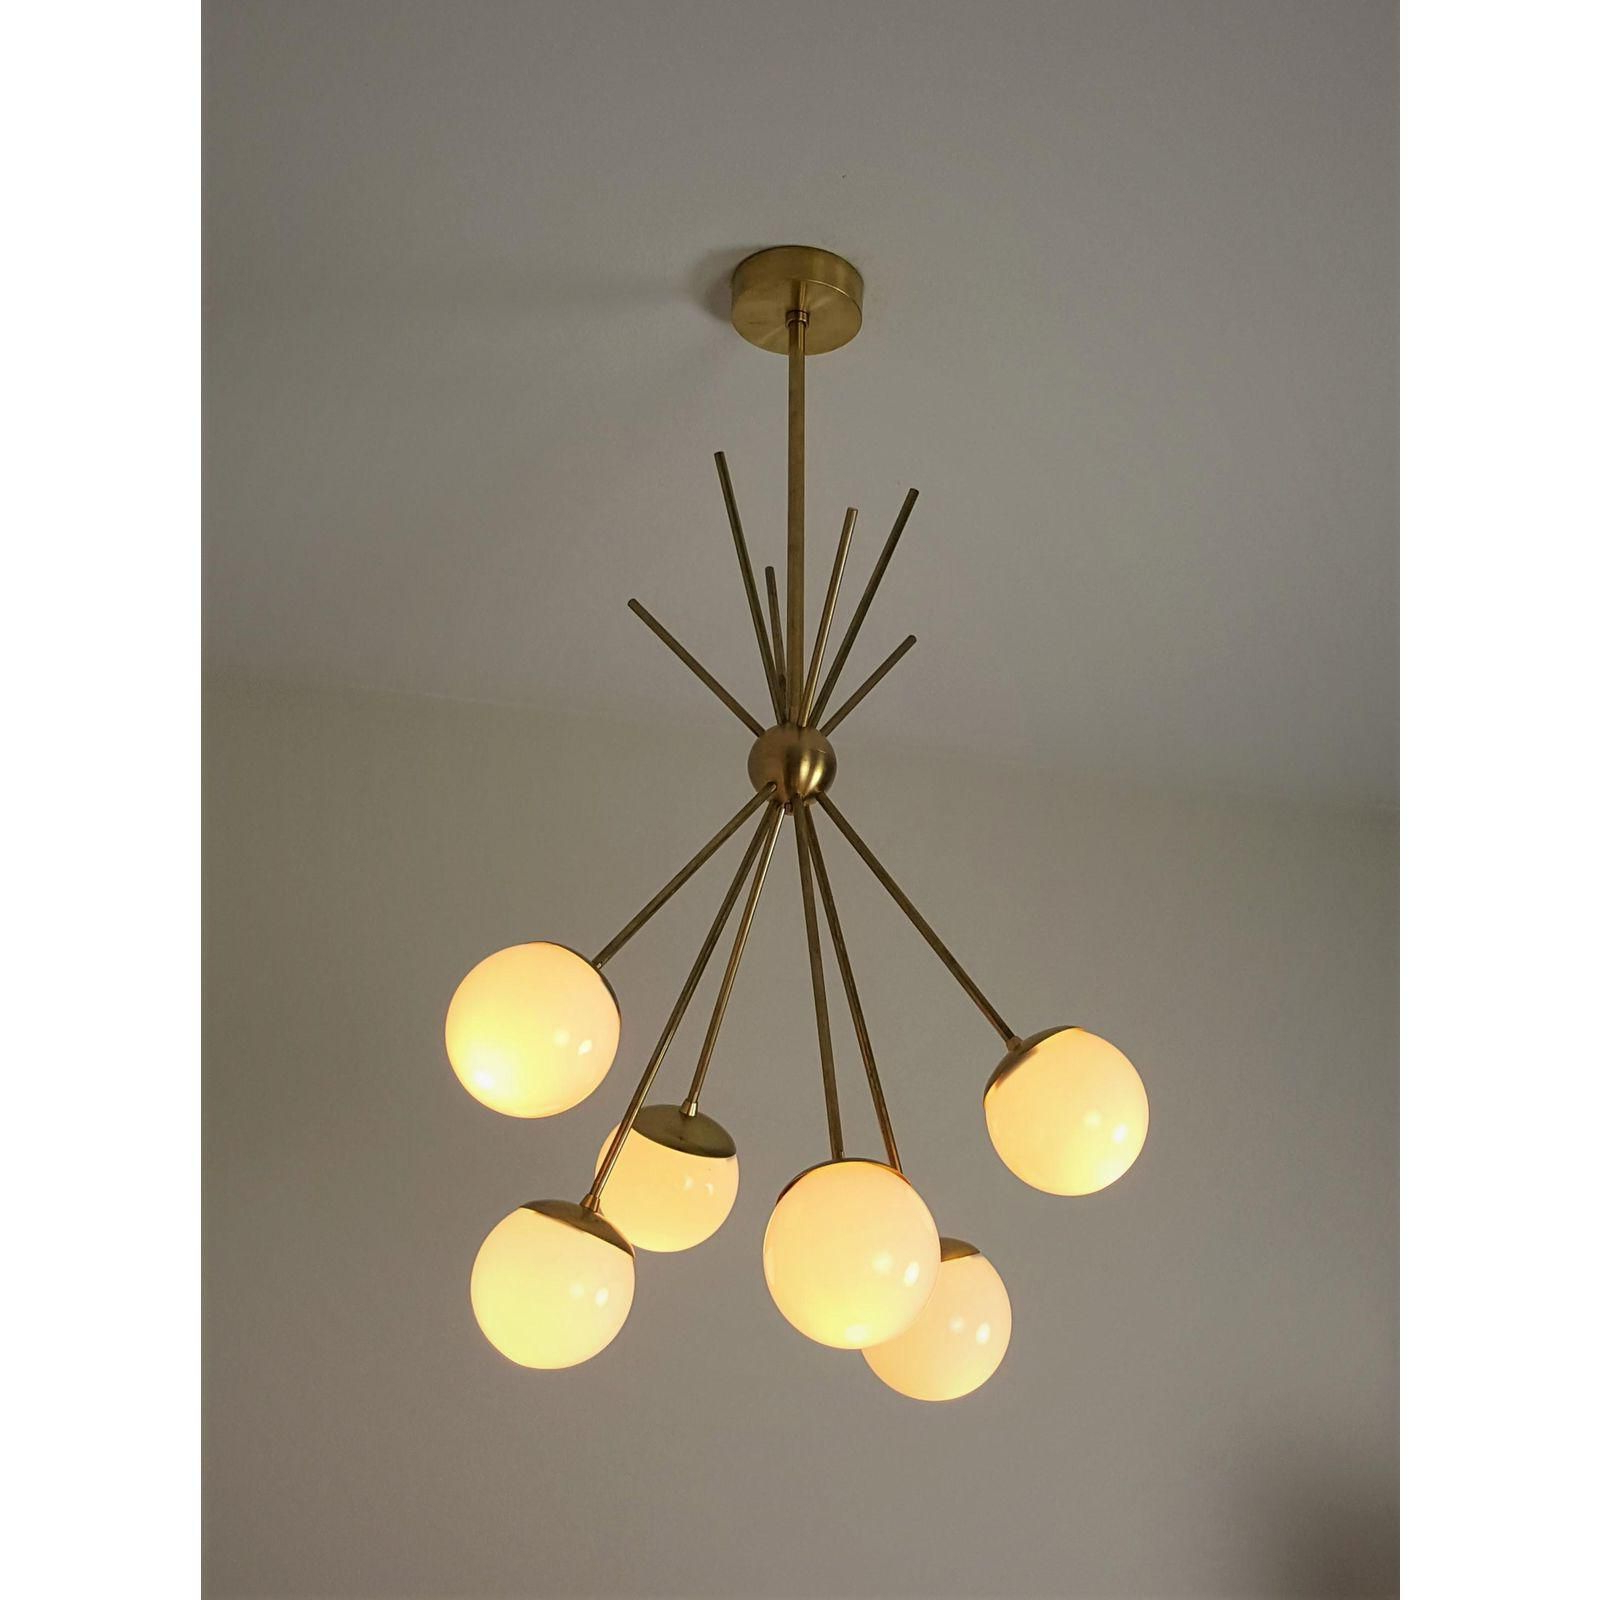 "Well Known Burst"" Model 220 Chandelierblueprint Lighting – Image 5 Pertaining To Bautista 5 Light Sputnik Chandeliers (View 19 of 20)"